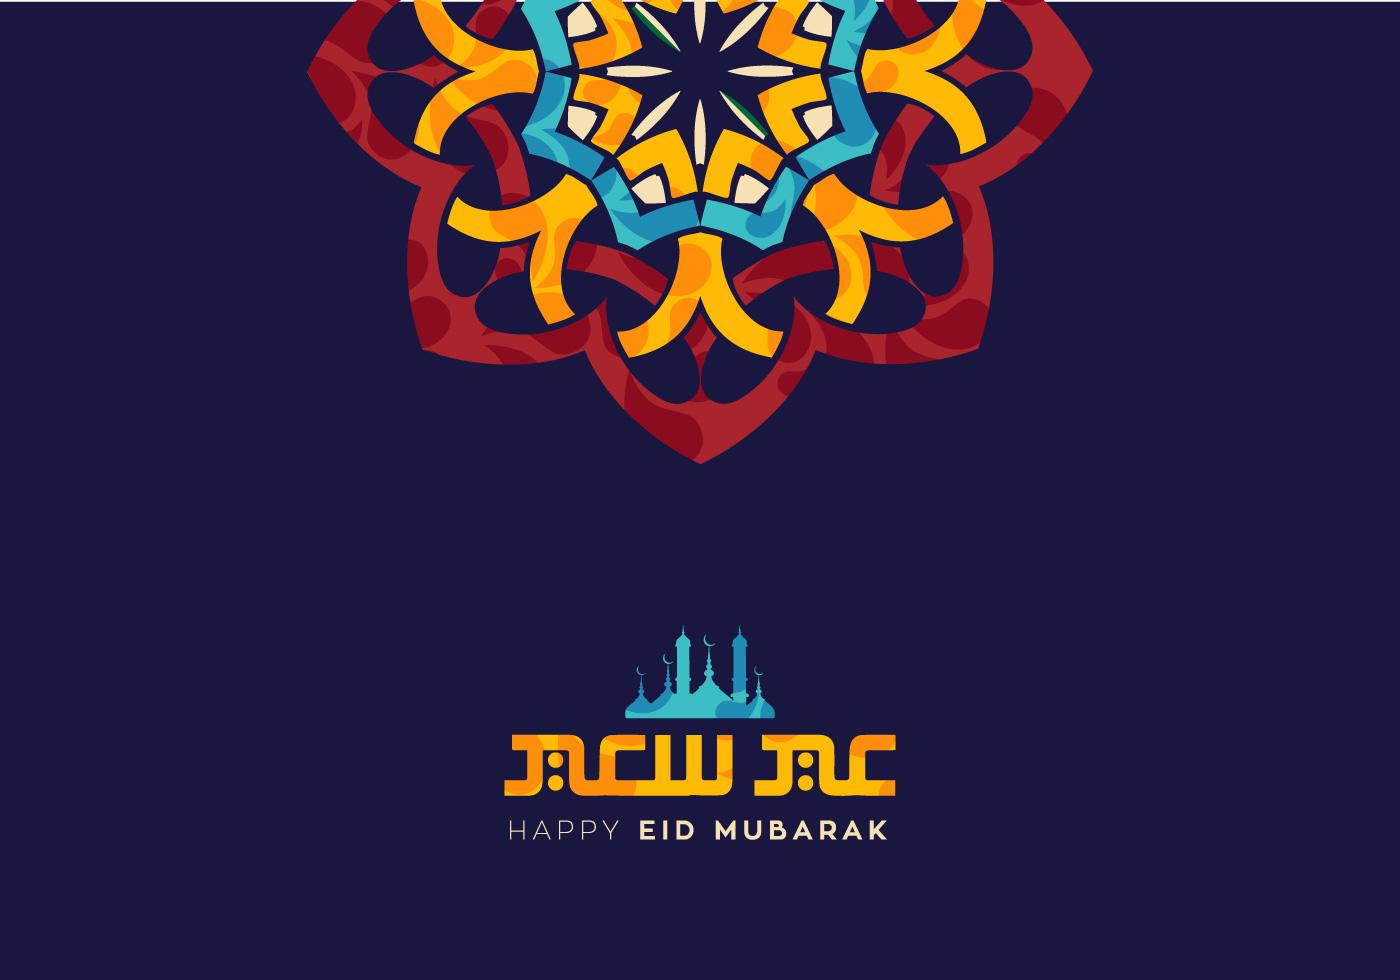 Vector Eid Al - Fitr - Download Free Vector Art, Stock ...